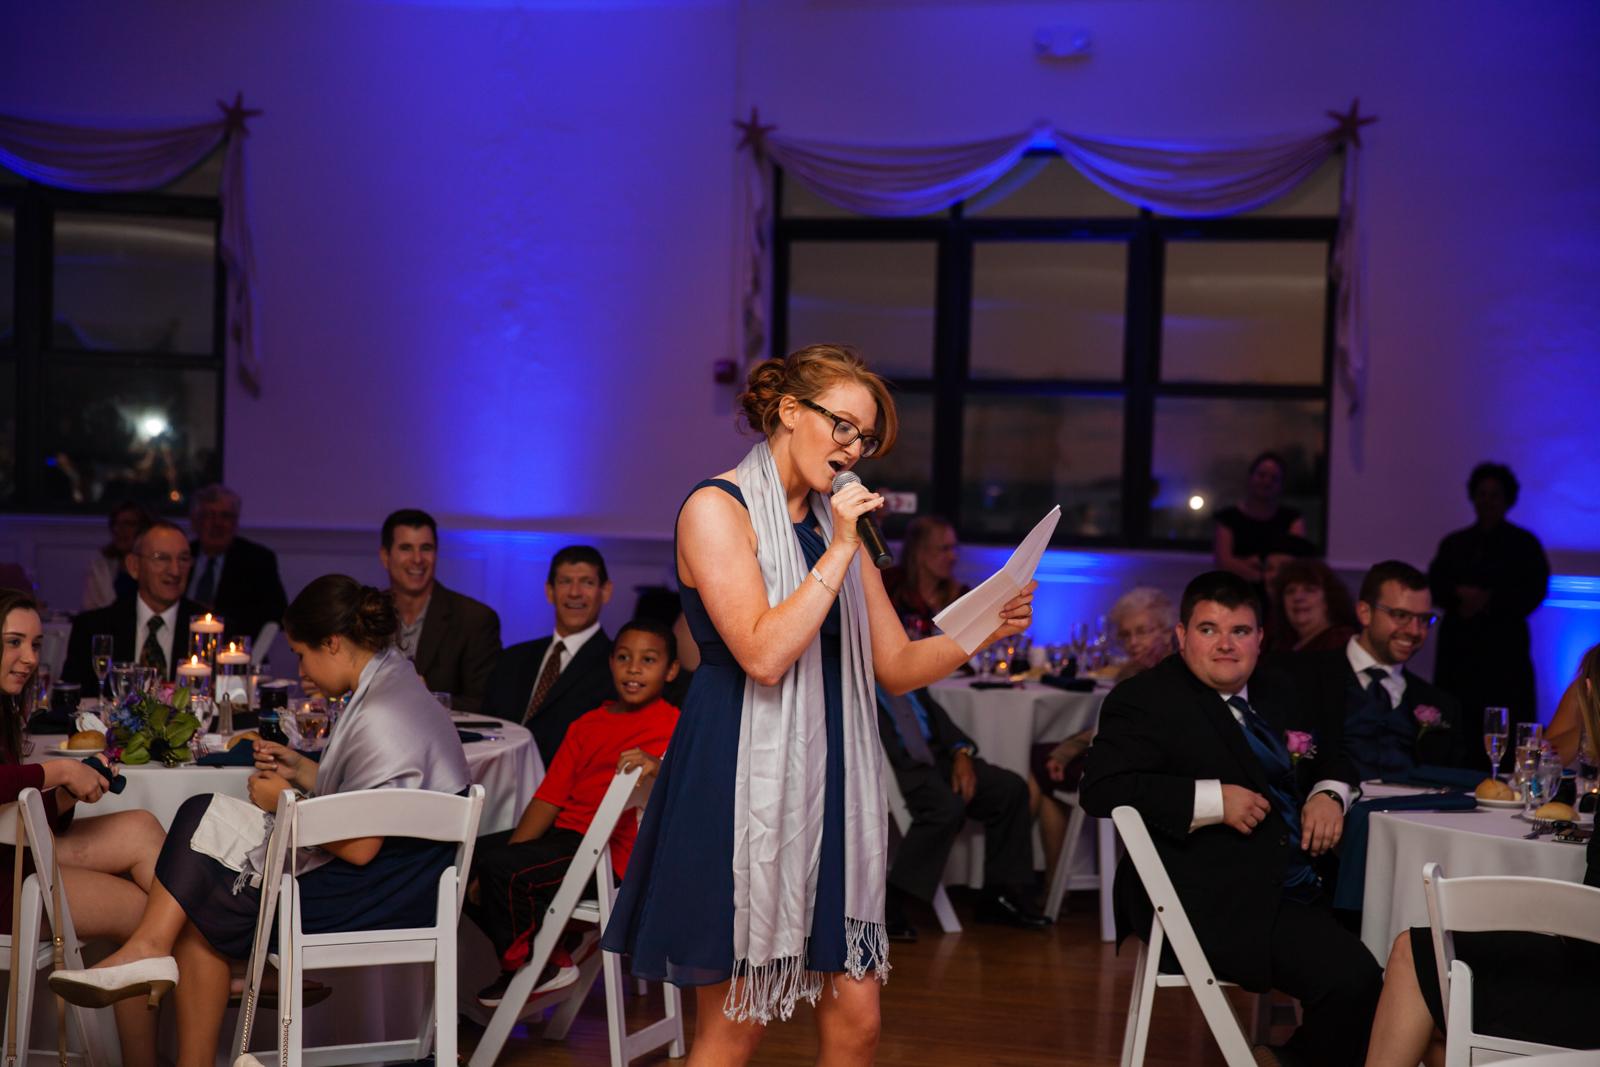 Eastons-Beach-Rotunda-Ballroom-Wedding-Newport-Rhode-Island-PhotographybyAmandaMorgan-106.jpg